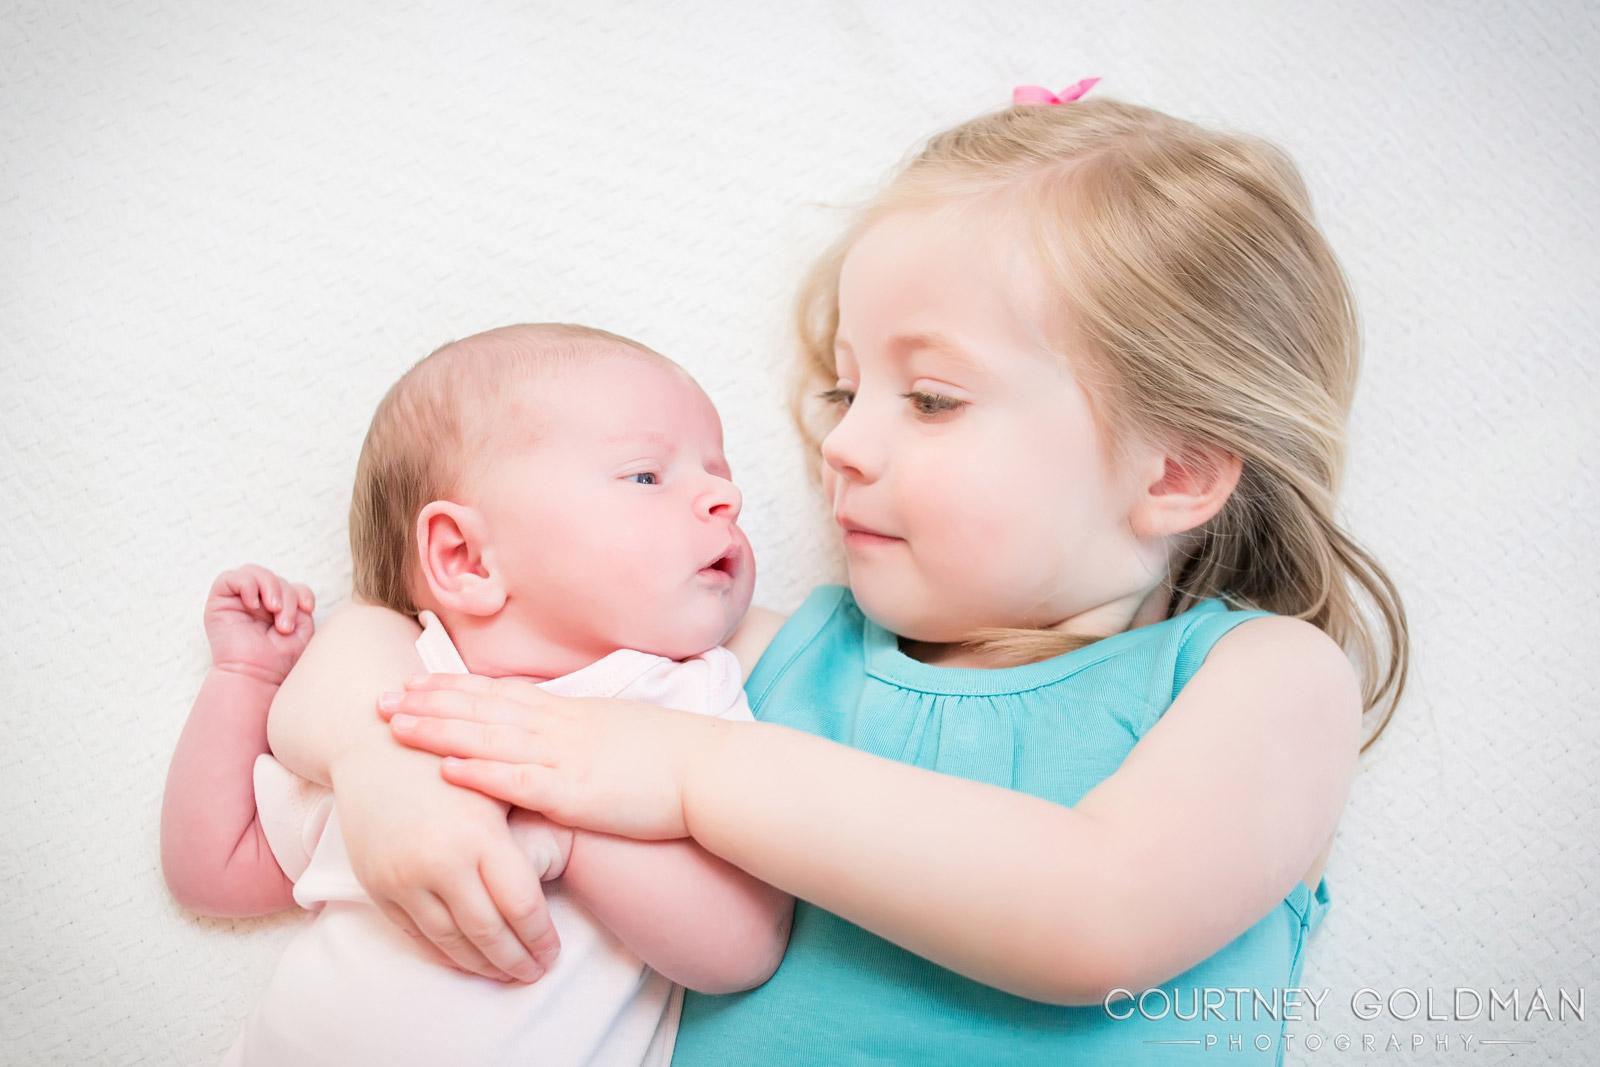 Atlanta Maternity and Newborn Photography by Courtney Goldman 35.jpg